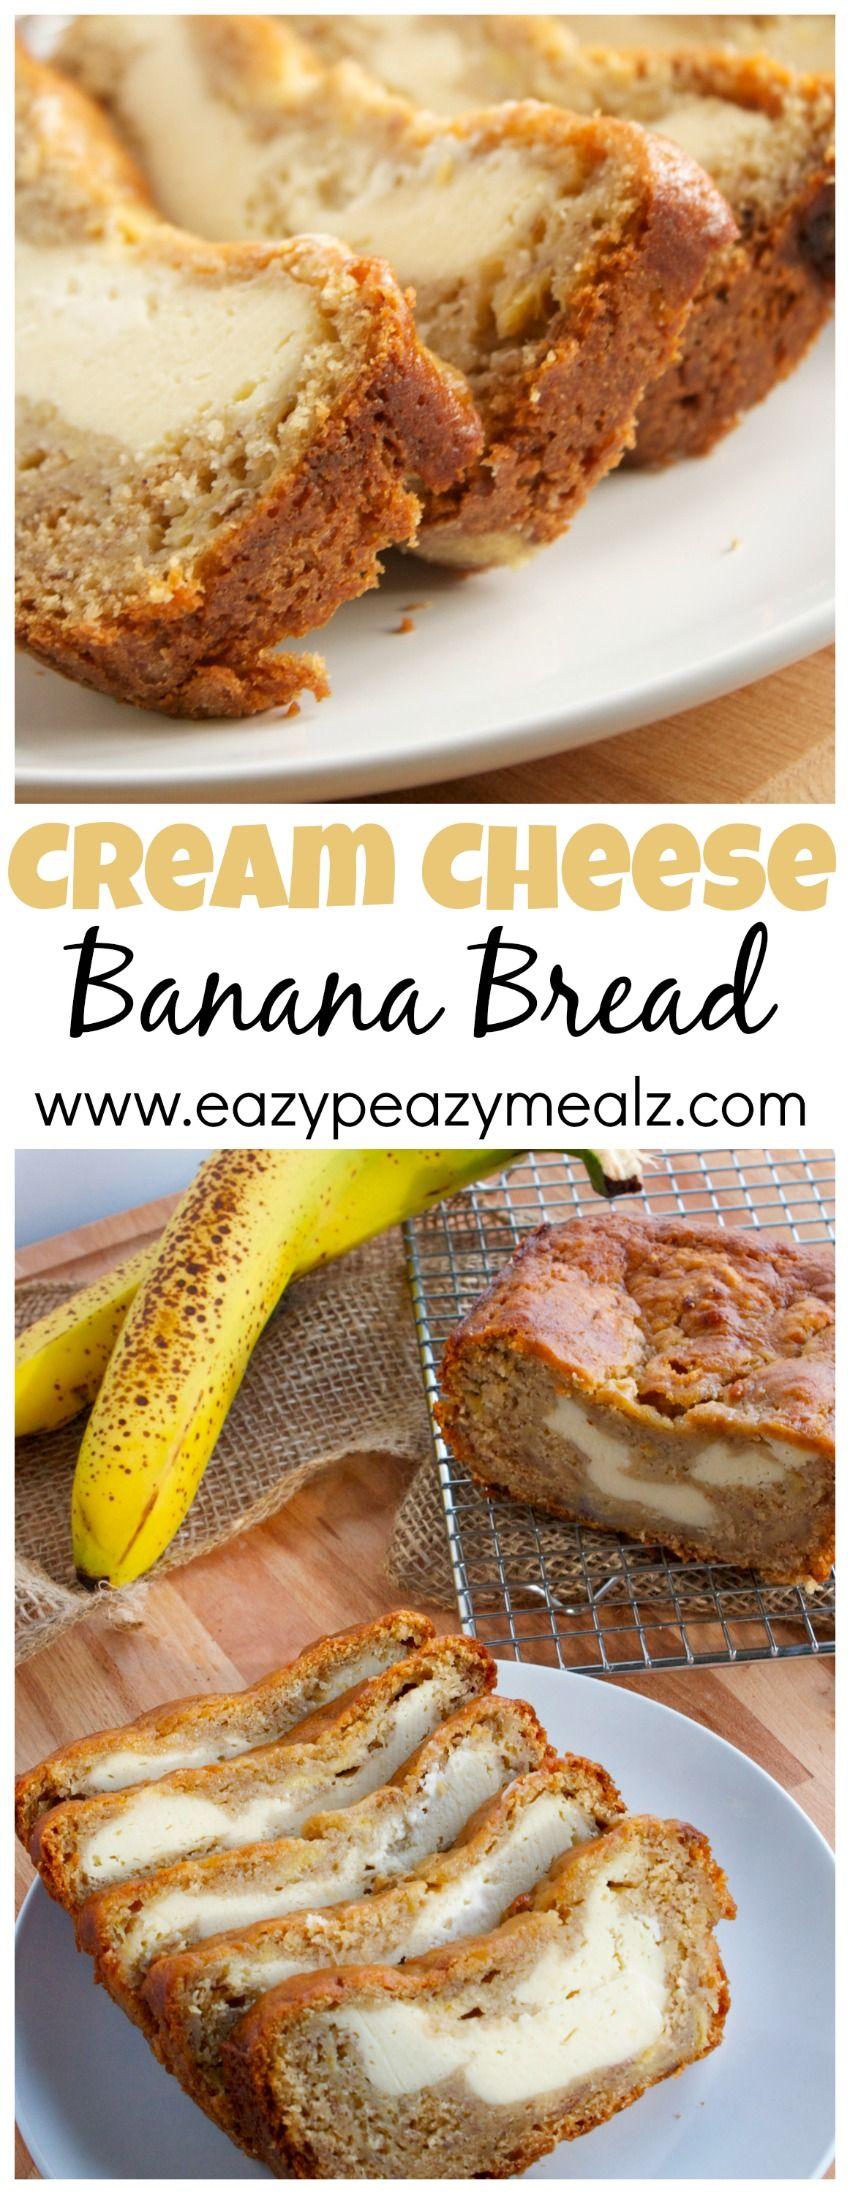 Cream Cheese Banana Bread Easy Peasy Meals Recipe Best Banana Bread Recipes Delicious Desserts